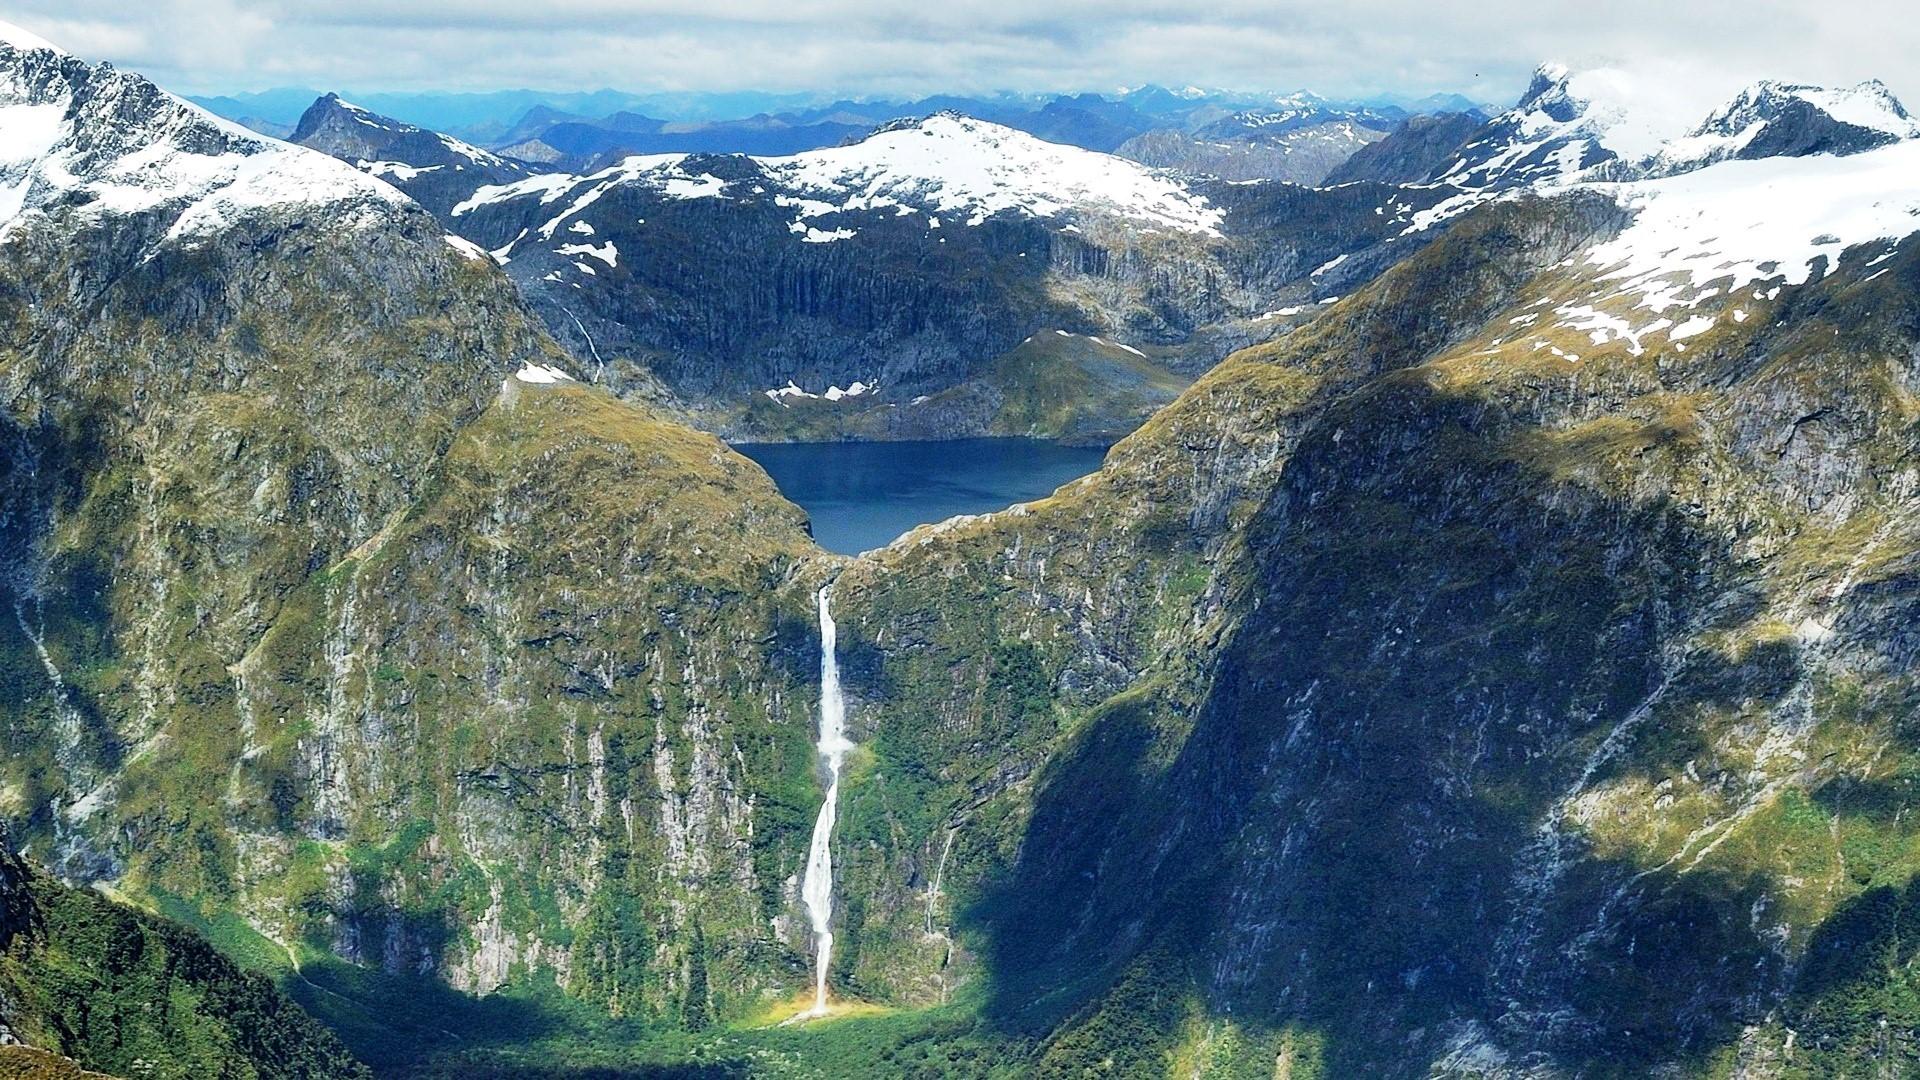 Sutherland Waterfall In New Zealand - Sutherland Waterfall New Zealand - HD Wallpaper